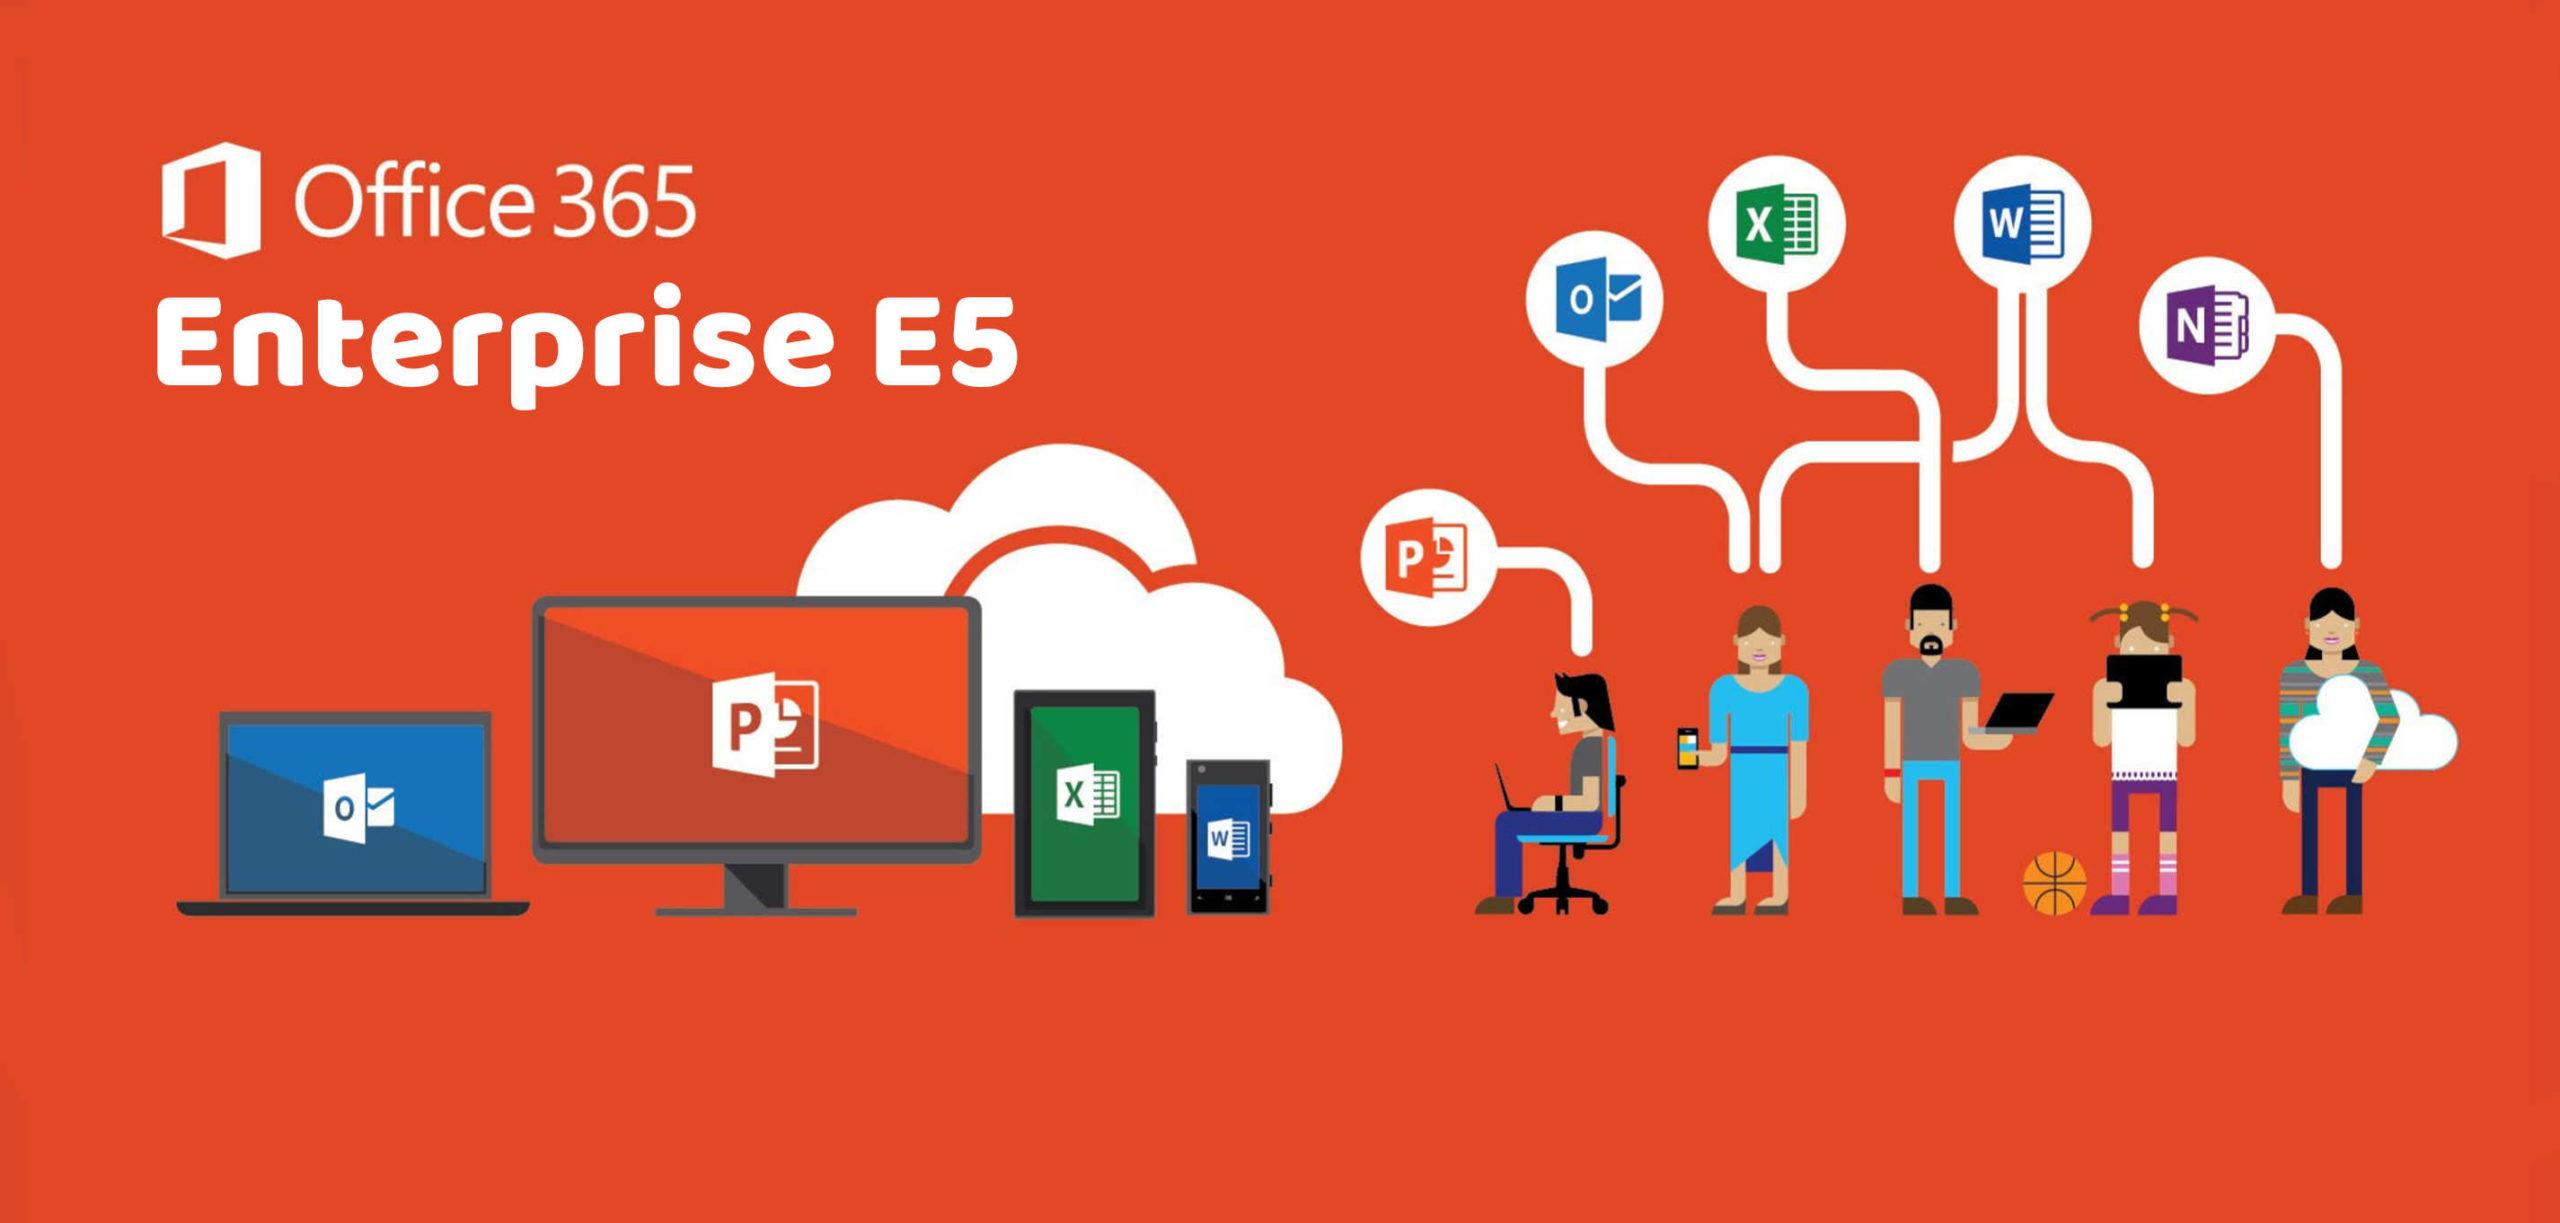 Sử dụng tài khoản Office 365 Enterprise E3